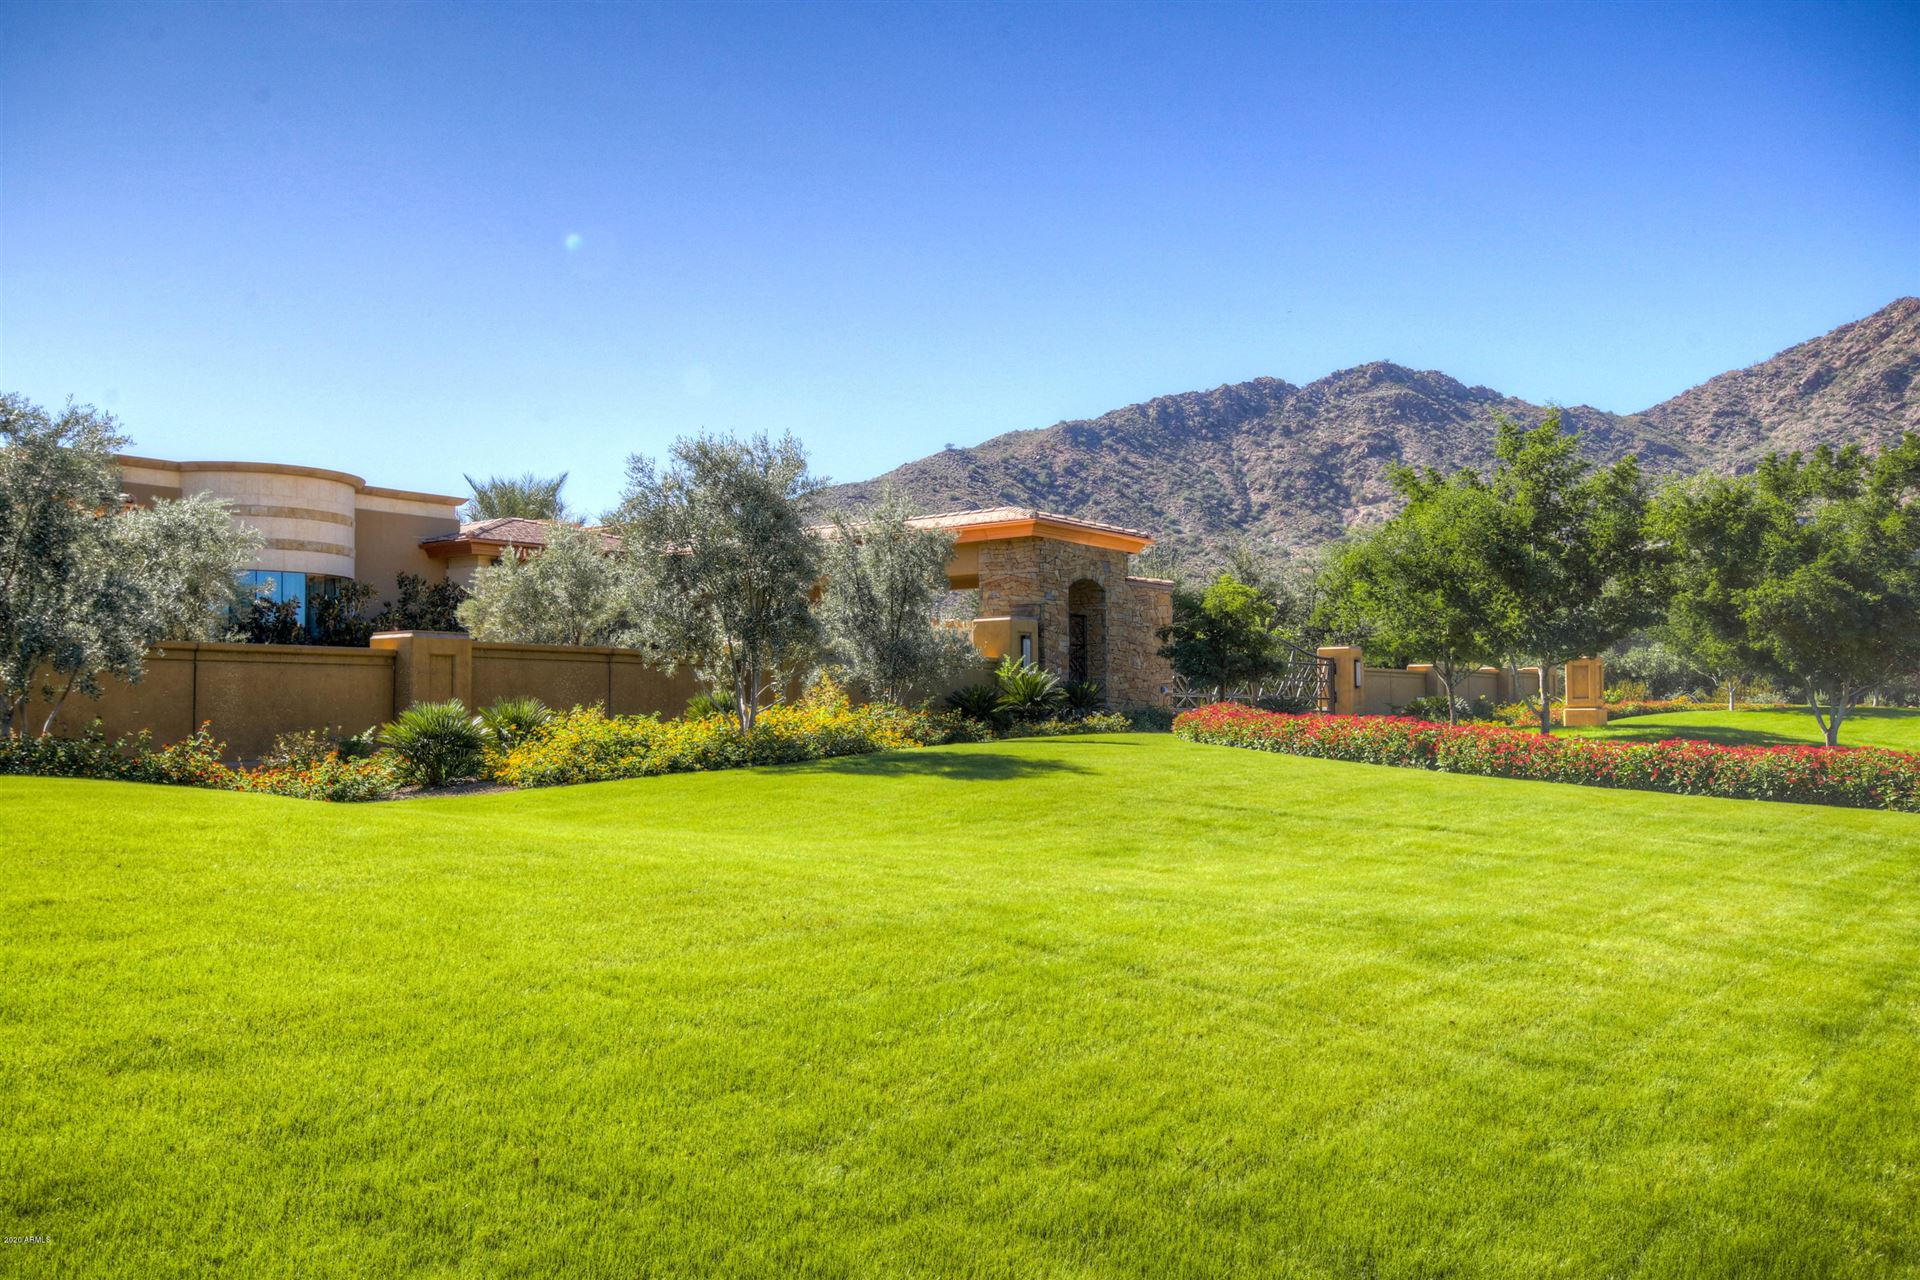 Photo of 5335 N INVERGORDON Road, Paradise Valley, AZ 85253 (MLS # 5892742)